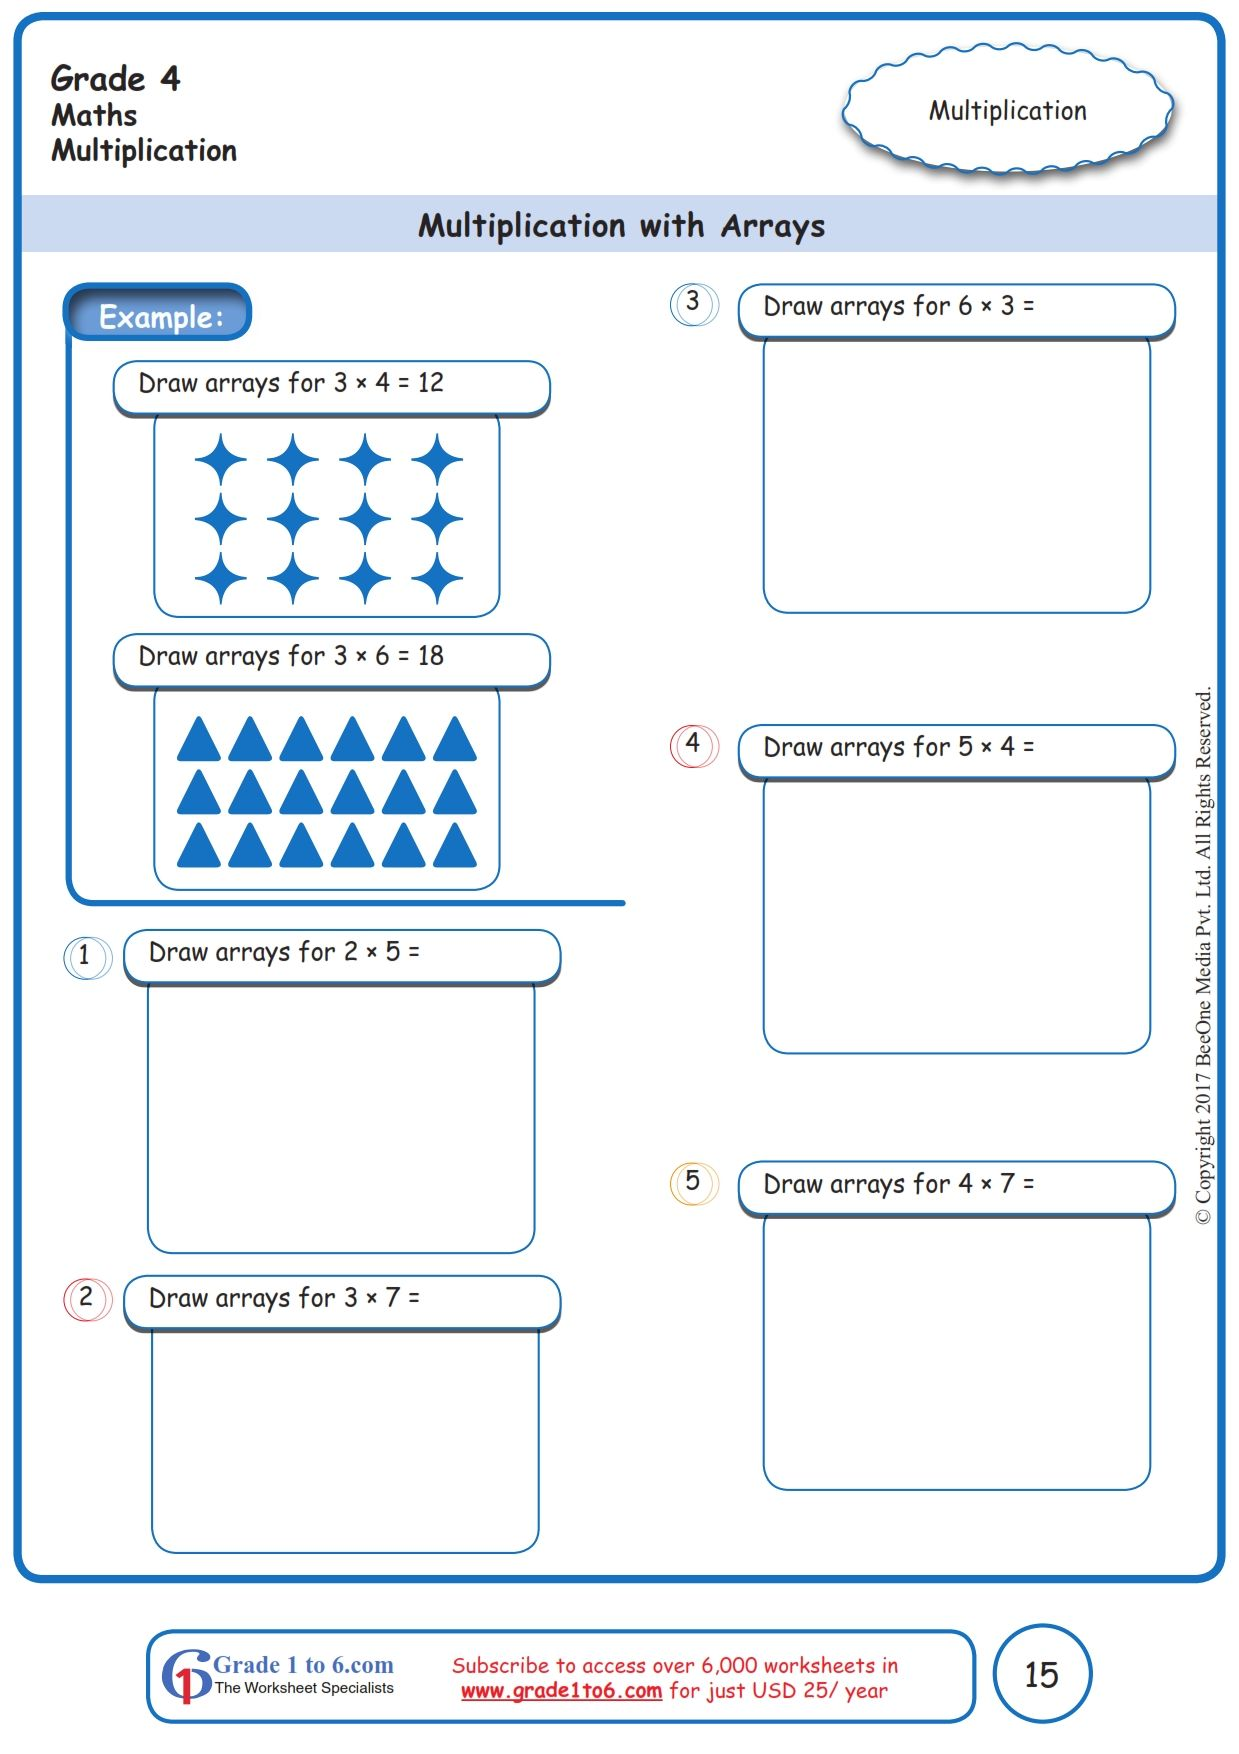 Worksheet Grade 4 Math Multiplication With Arrays In 2020 Free Math Worksheets Math Worksheets Free Math